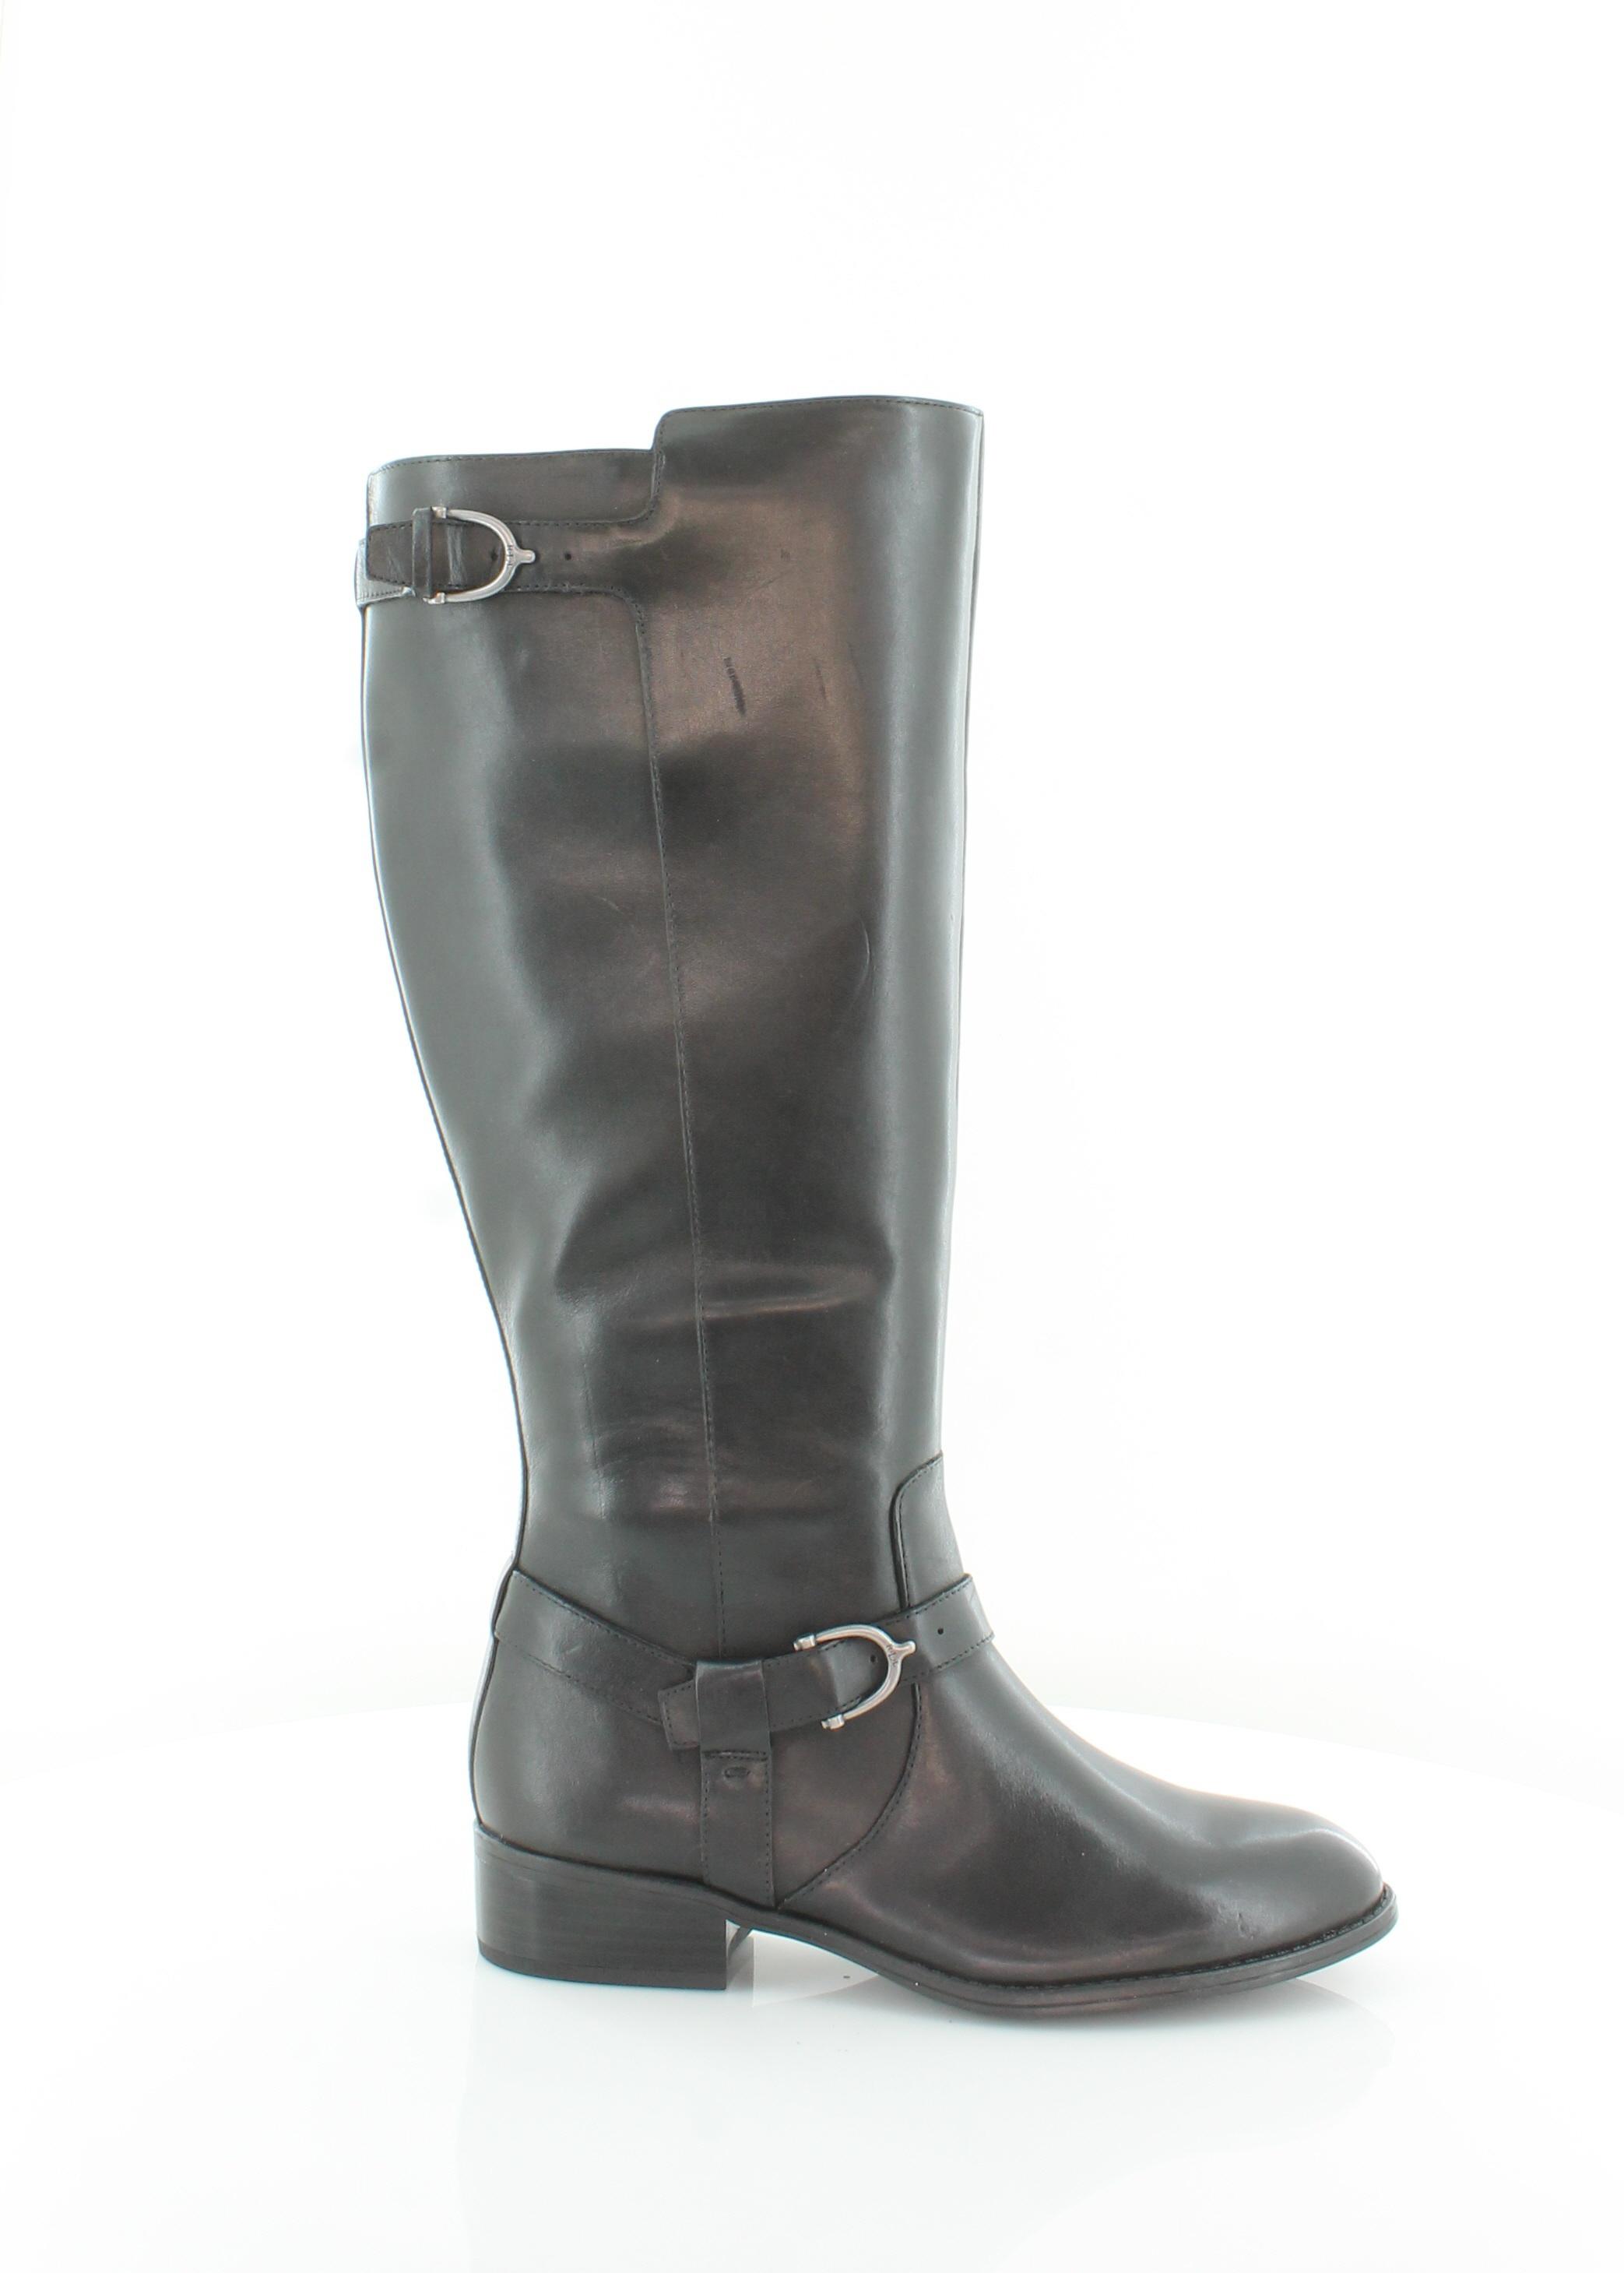 Ralph Lauren Margarite Negro botas para para para mujer zapatos talla 6.5 M MSRP  179  envío gratuito a nivel mundial